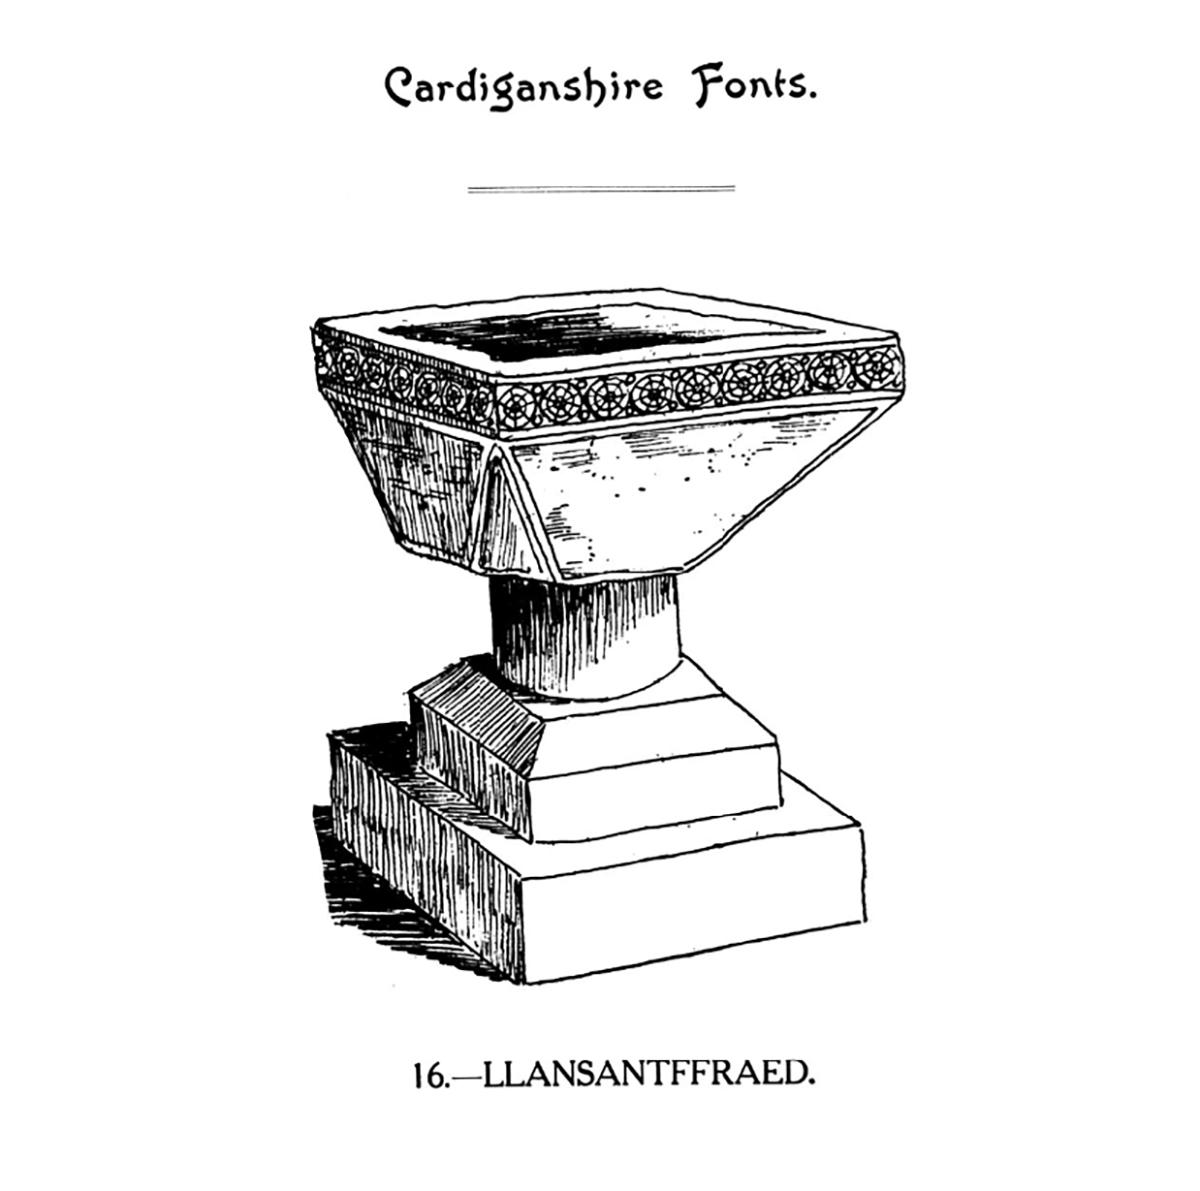 Bedyddfeini Sir Aberteifi - Llansanffraid